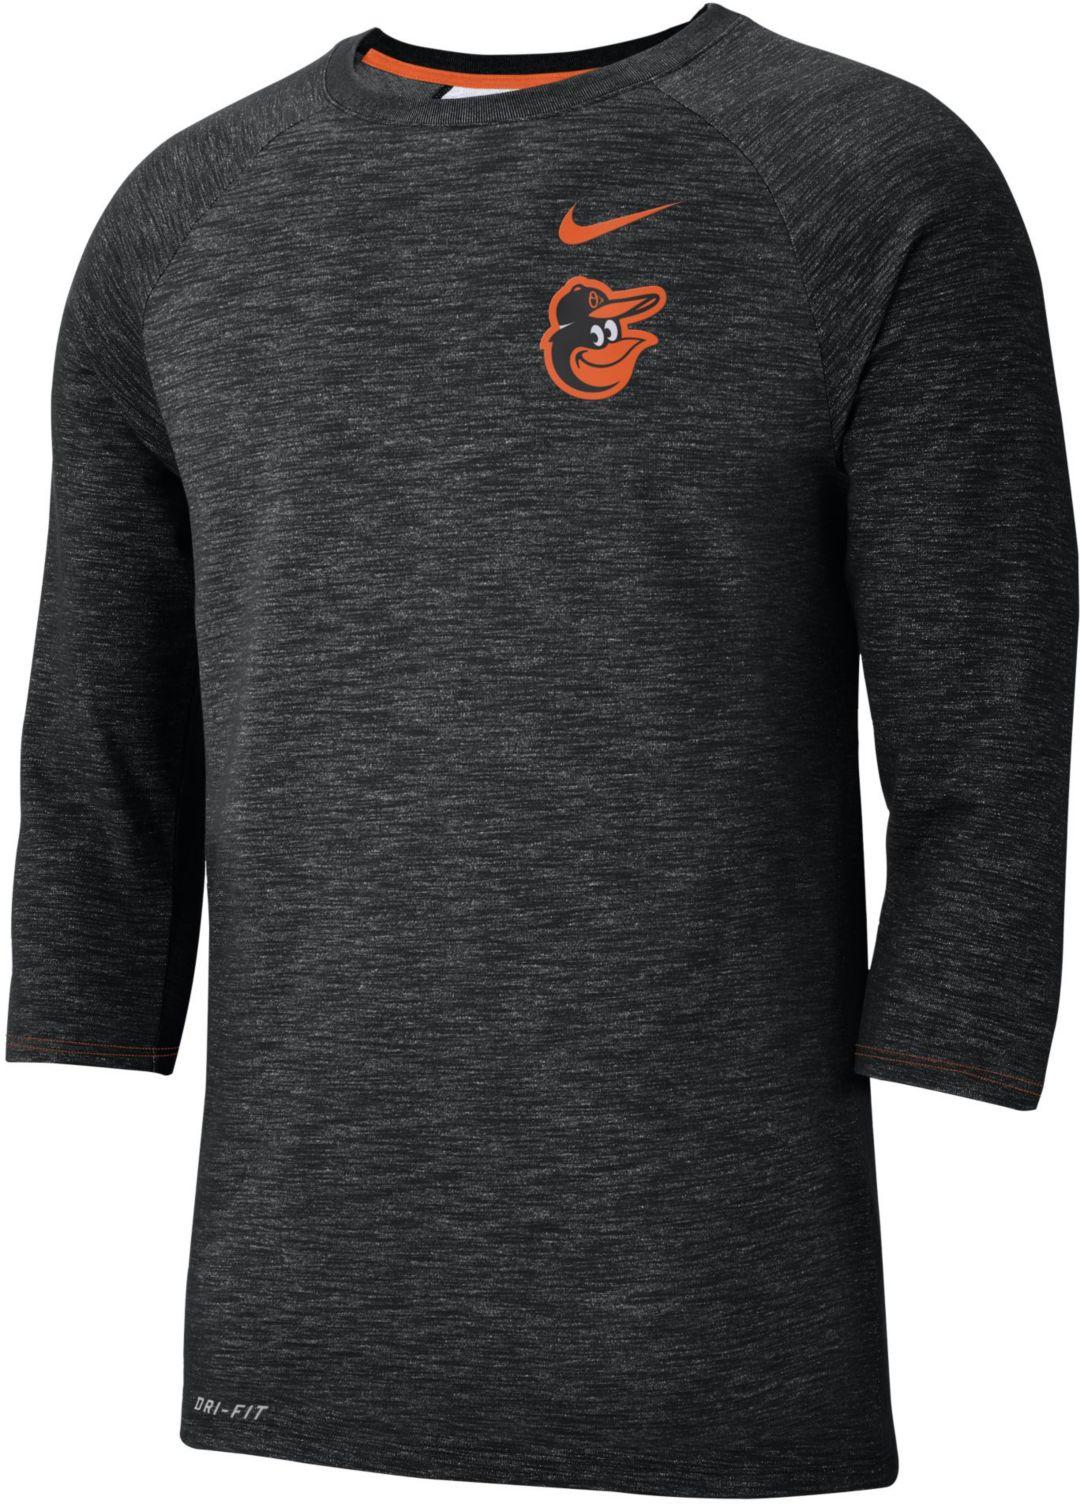 hot sale online a7c21 6d66f Nike Men's Baltimore Orioles Dri-FIT Slub Three-Quarter Sleeve Shirt